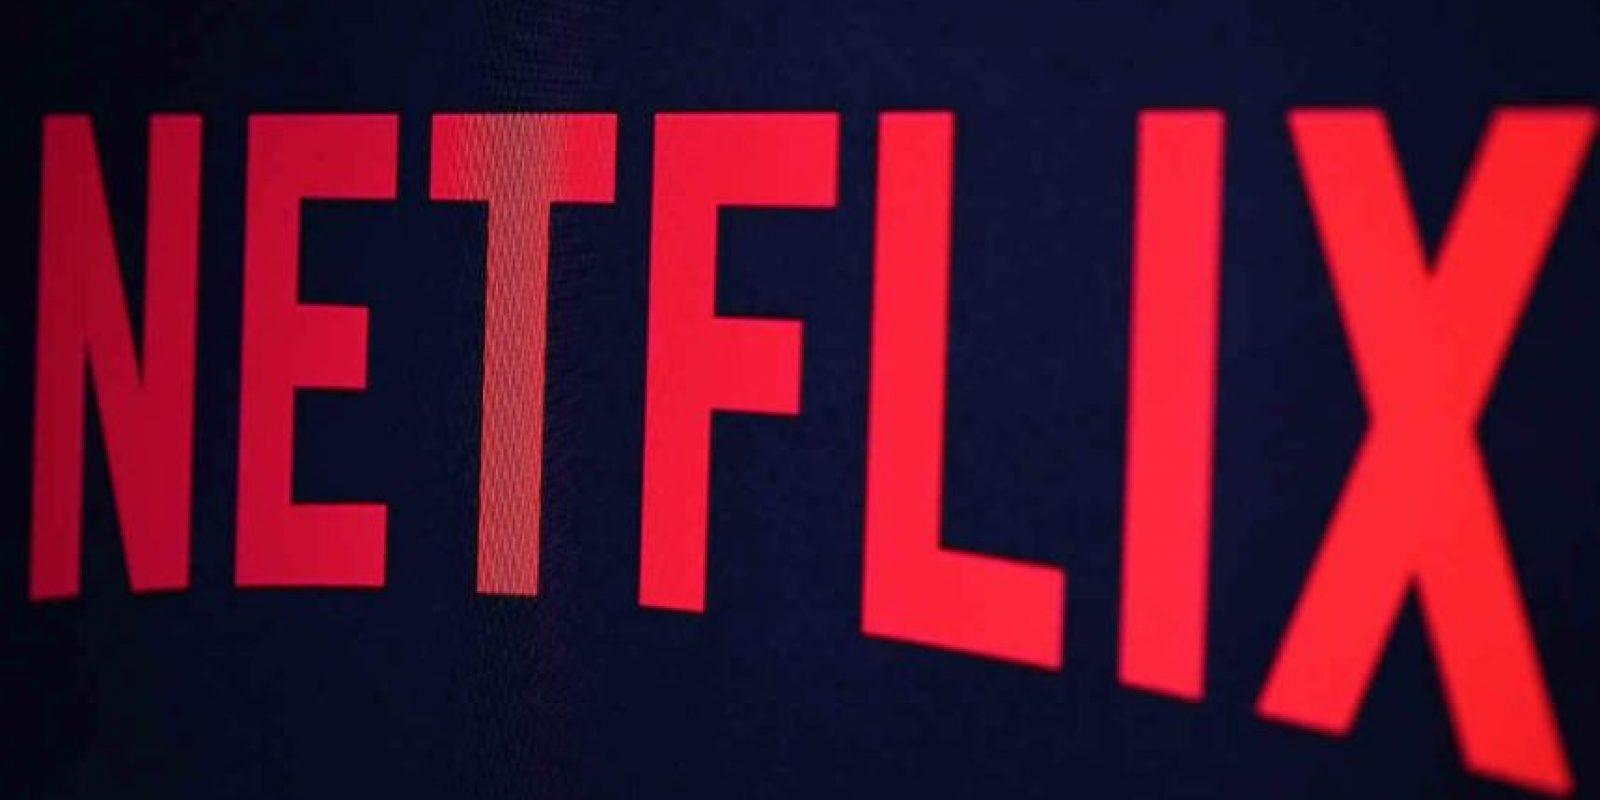 El creador de Netflix lo creó específicamente para competir contra Blockbuster Foto:Getty Images